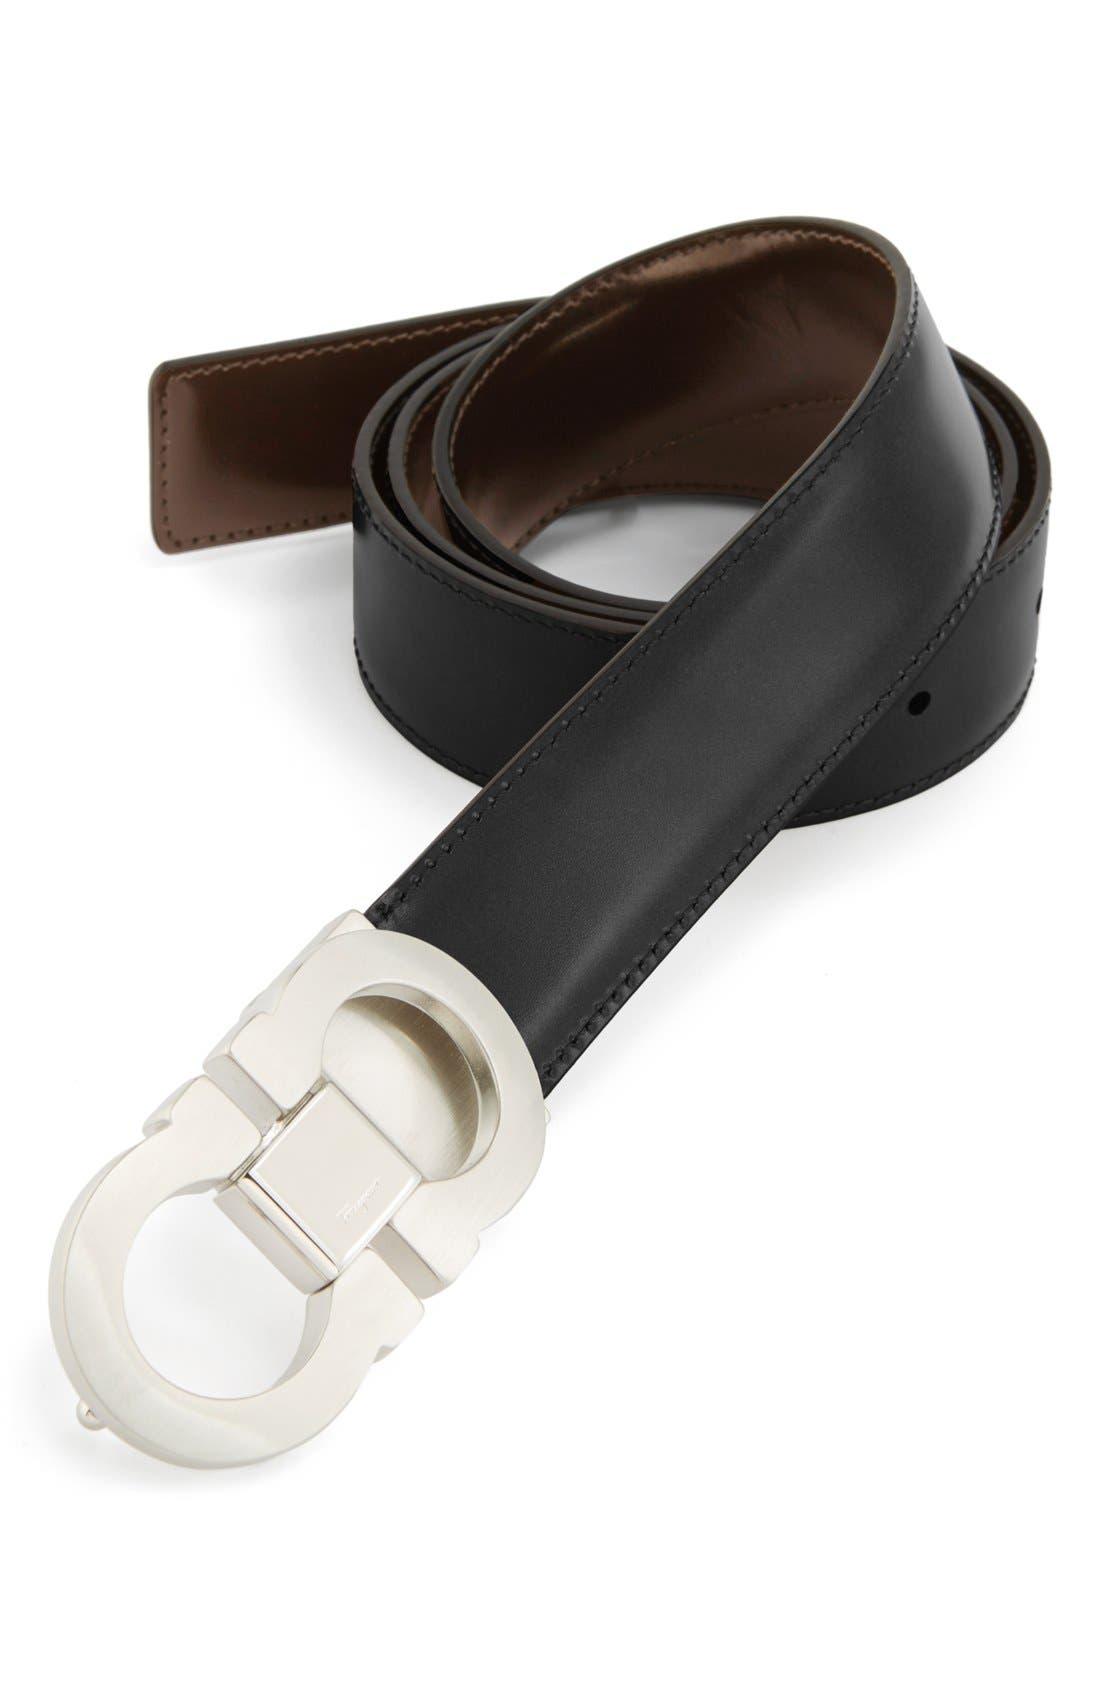 Main Image - Salvatore Ferragamo Double Gancio Reversible Leather Belt